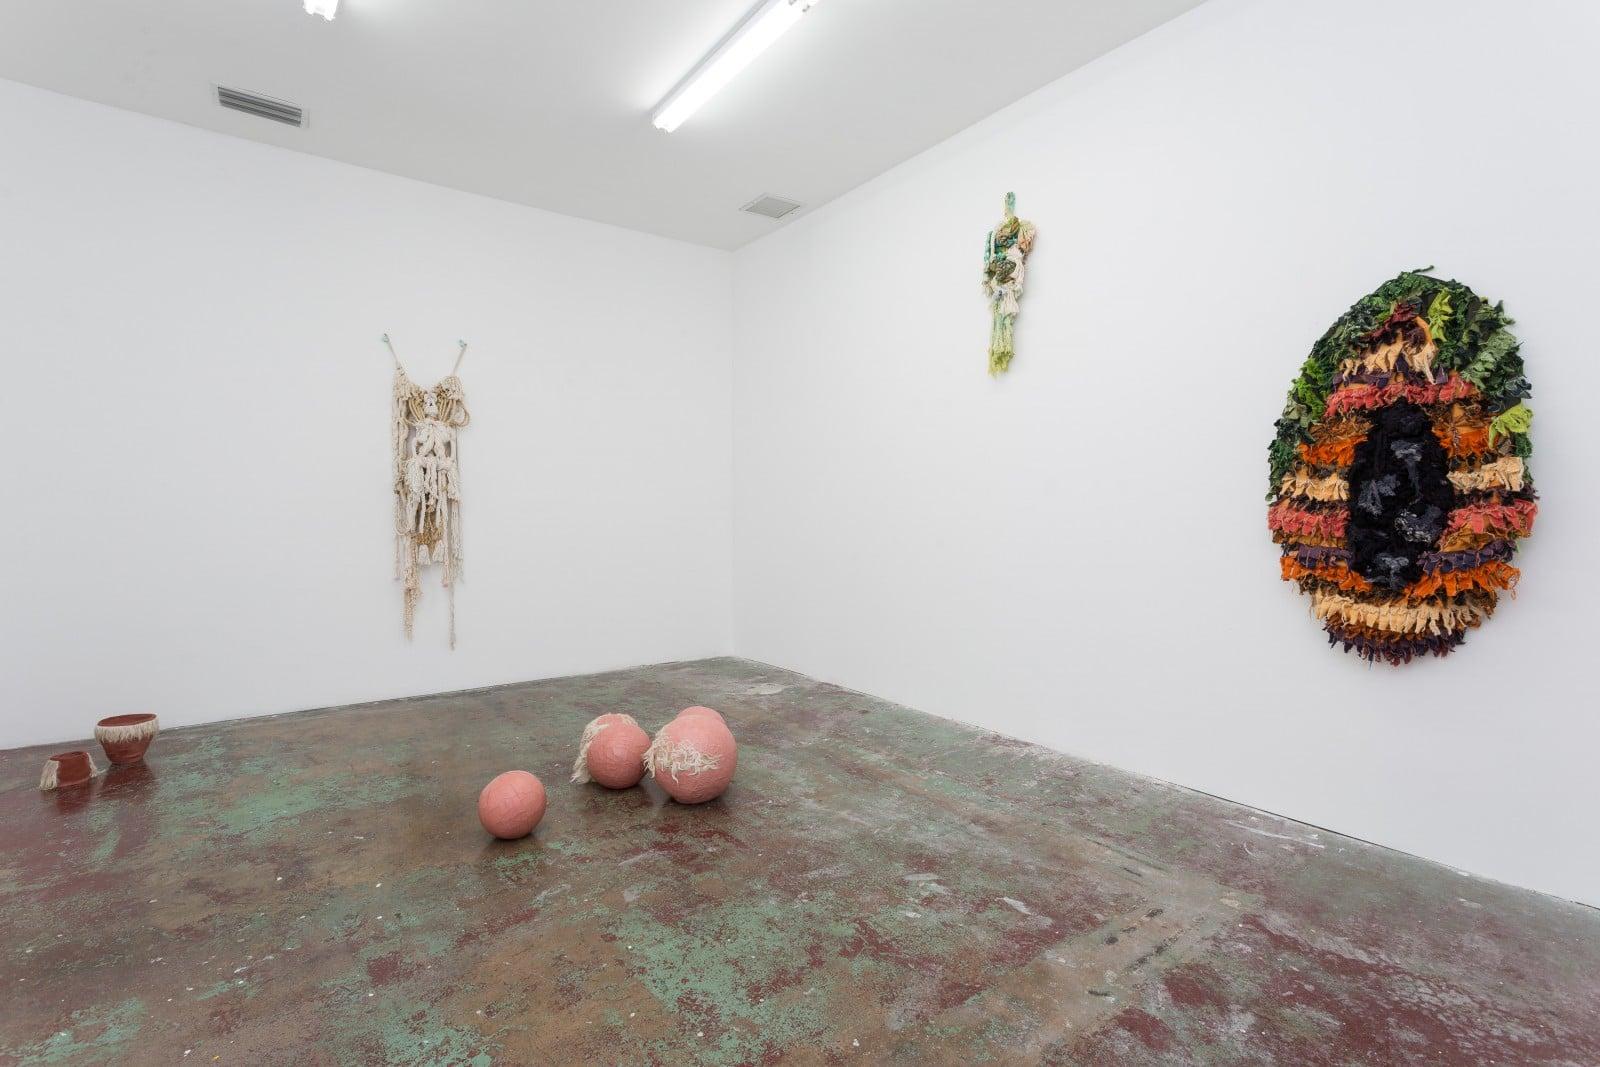 installation view, Bananas, Gallery Diet, Miami, June 19 - September 5, 2015